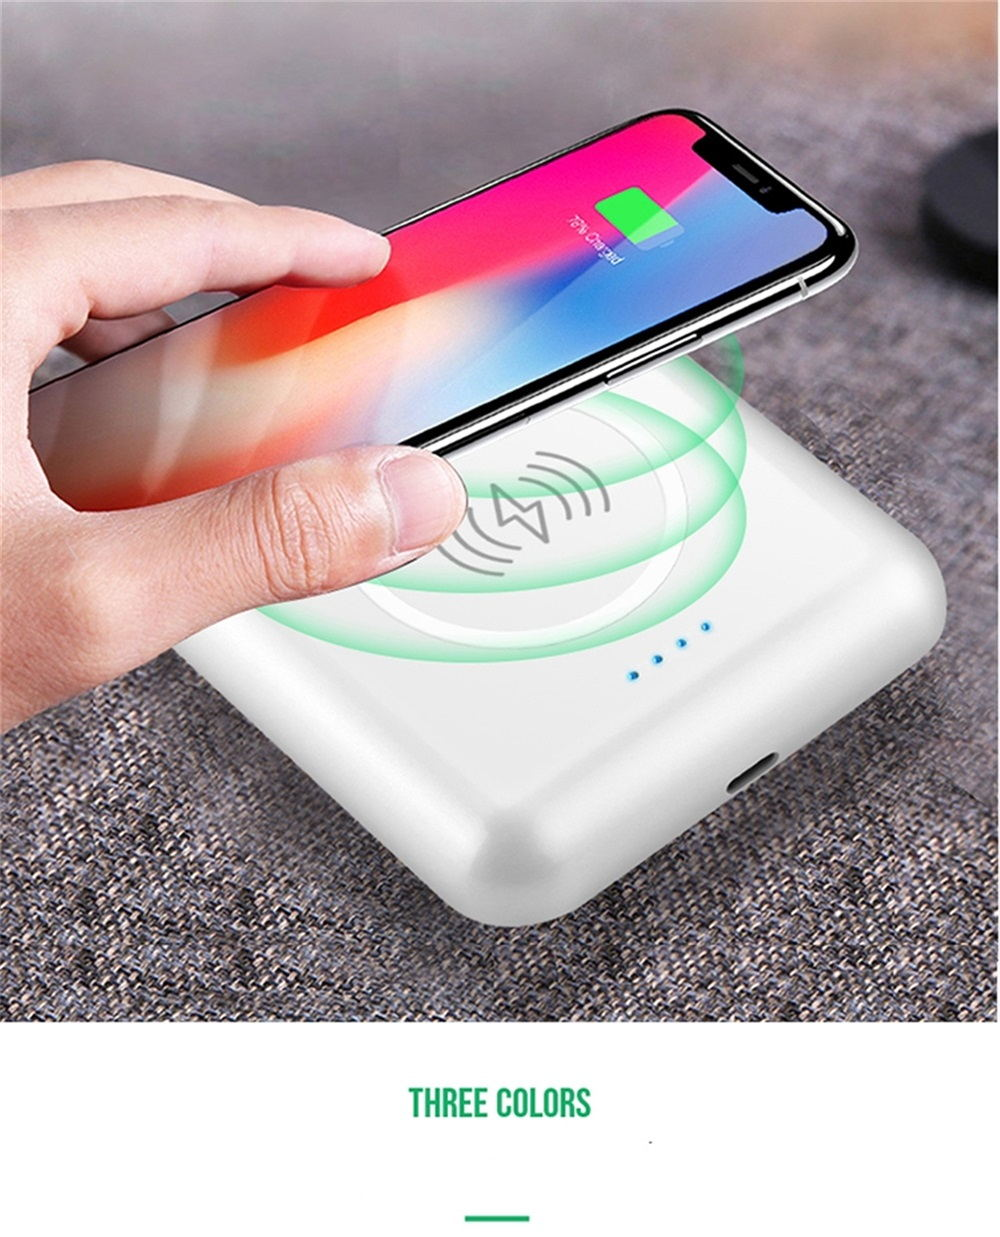 3-in-1 wireless charging mobile power headphones 2019